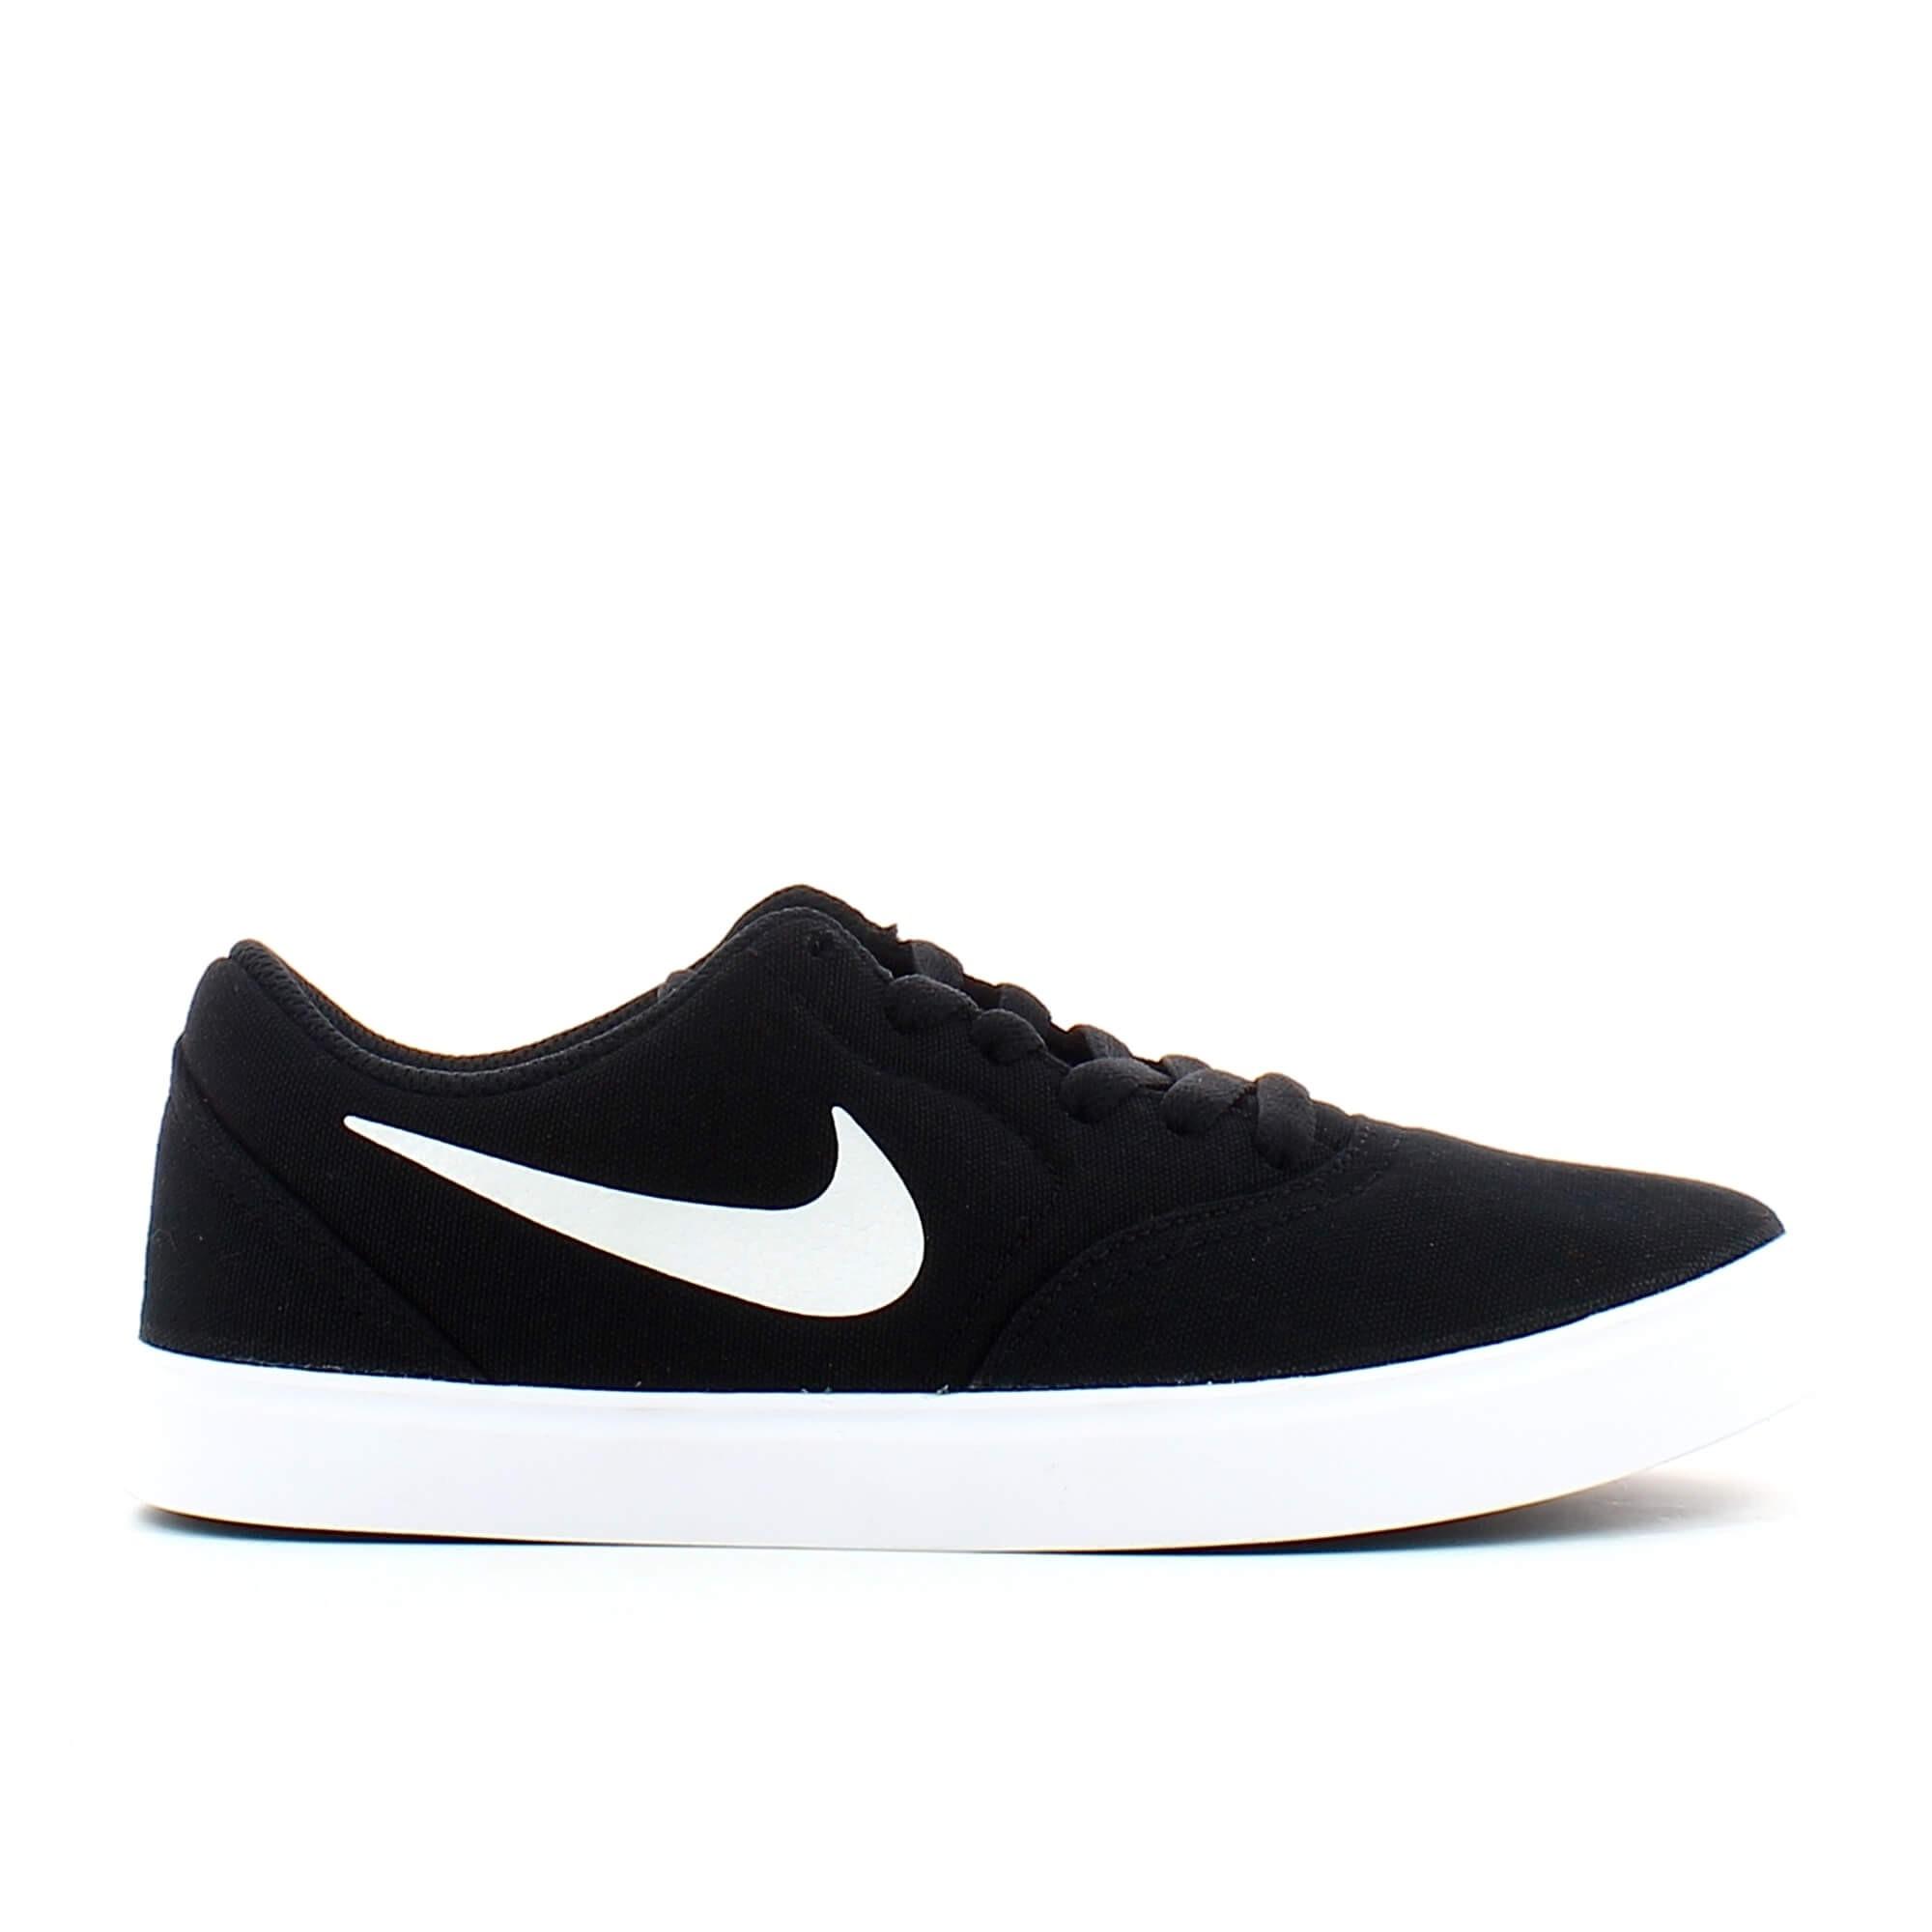 9443cb5064 Zapatillas Nike Sb Check Cnvs (Gs) Negro Junior - Deportes Moya